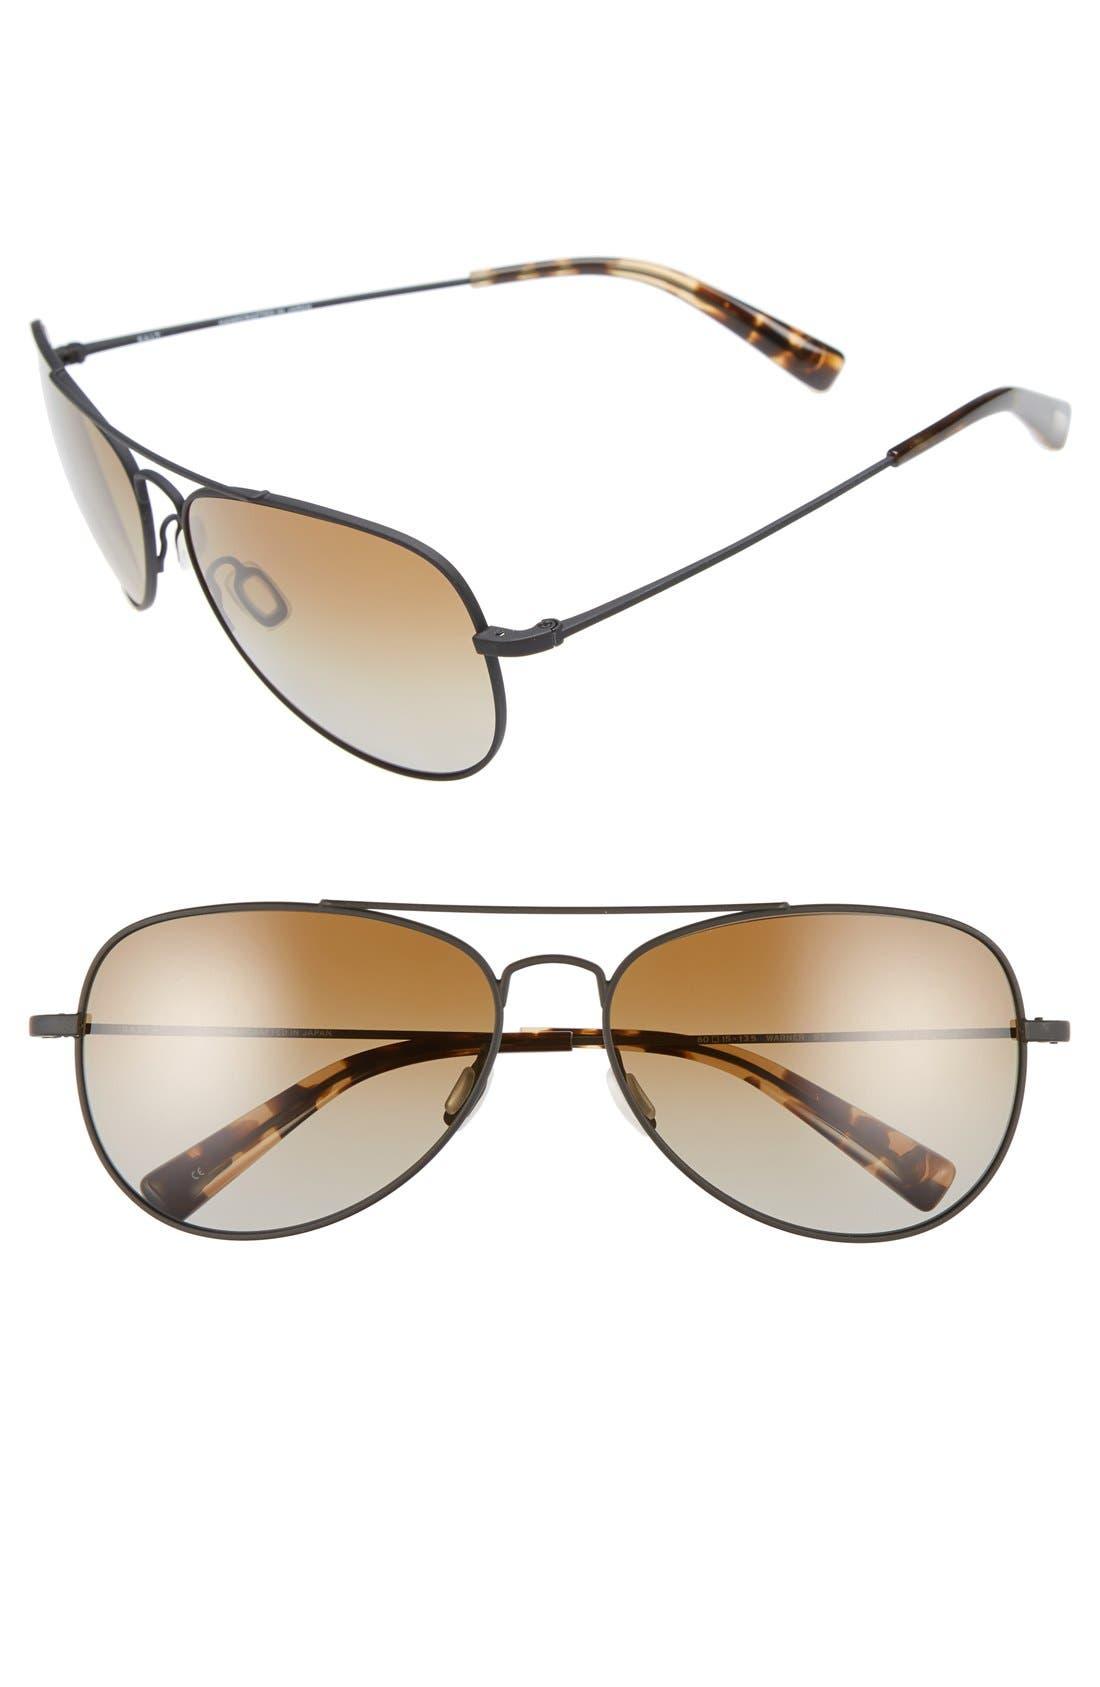 Main Image - SALT 'Warner' 60mm Polarized Sunglasses